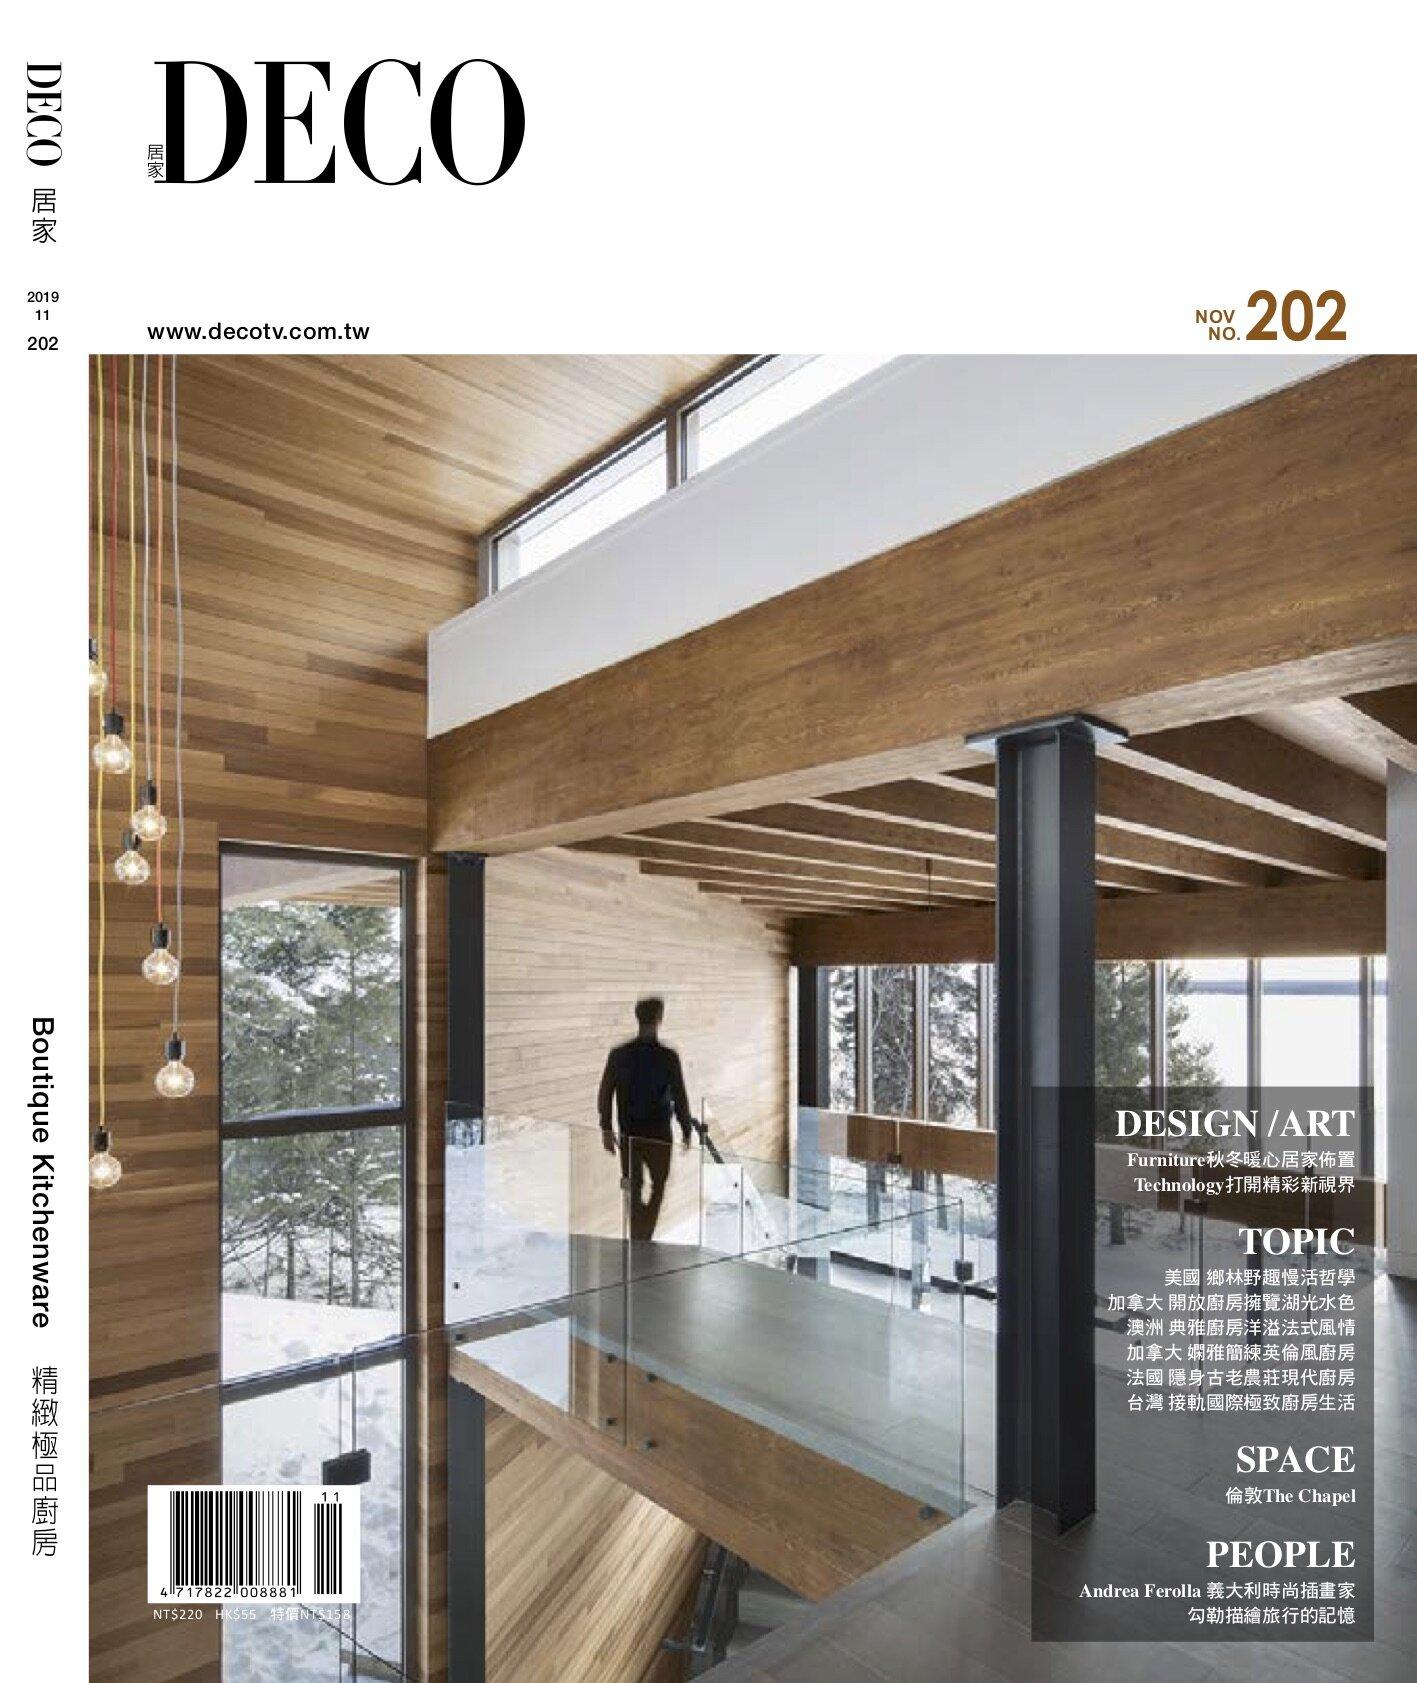 DECO-cover.jpg